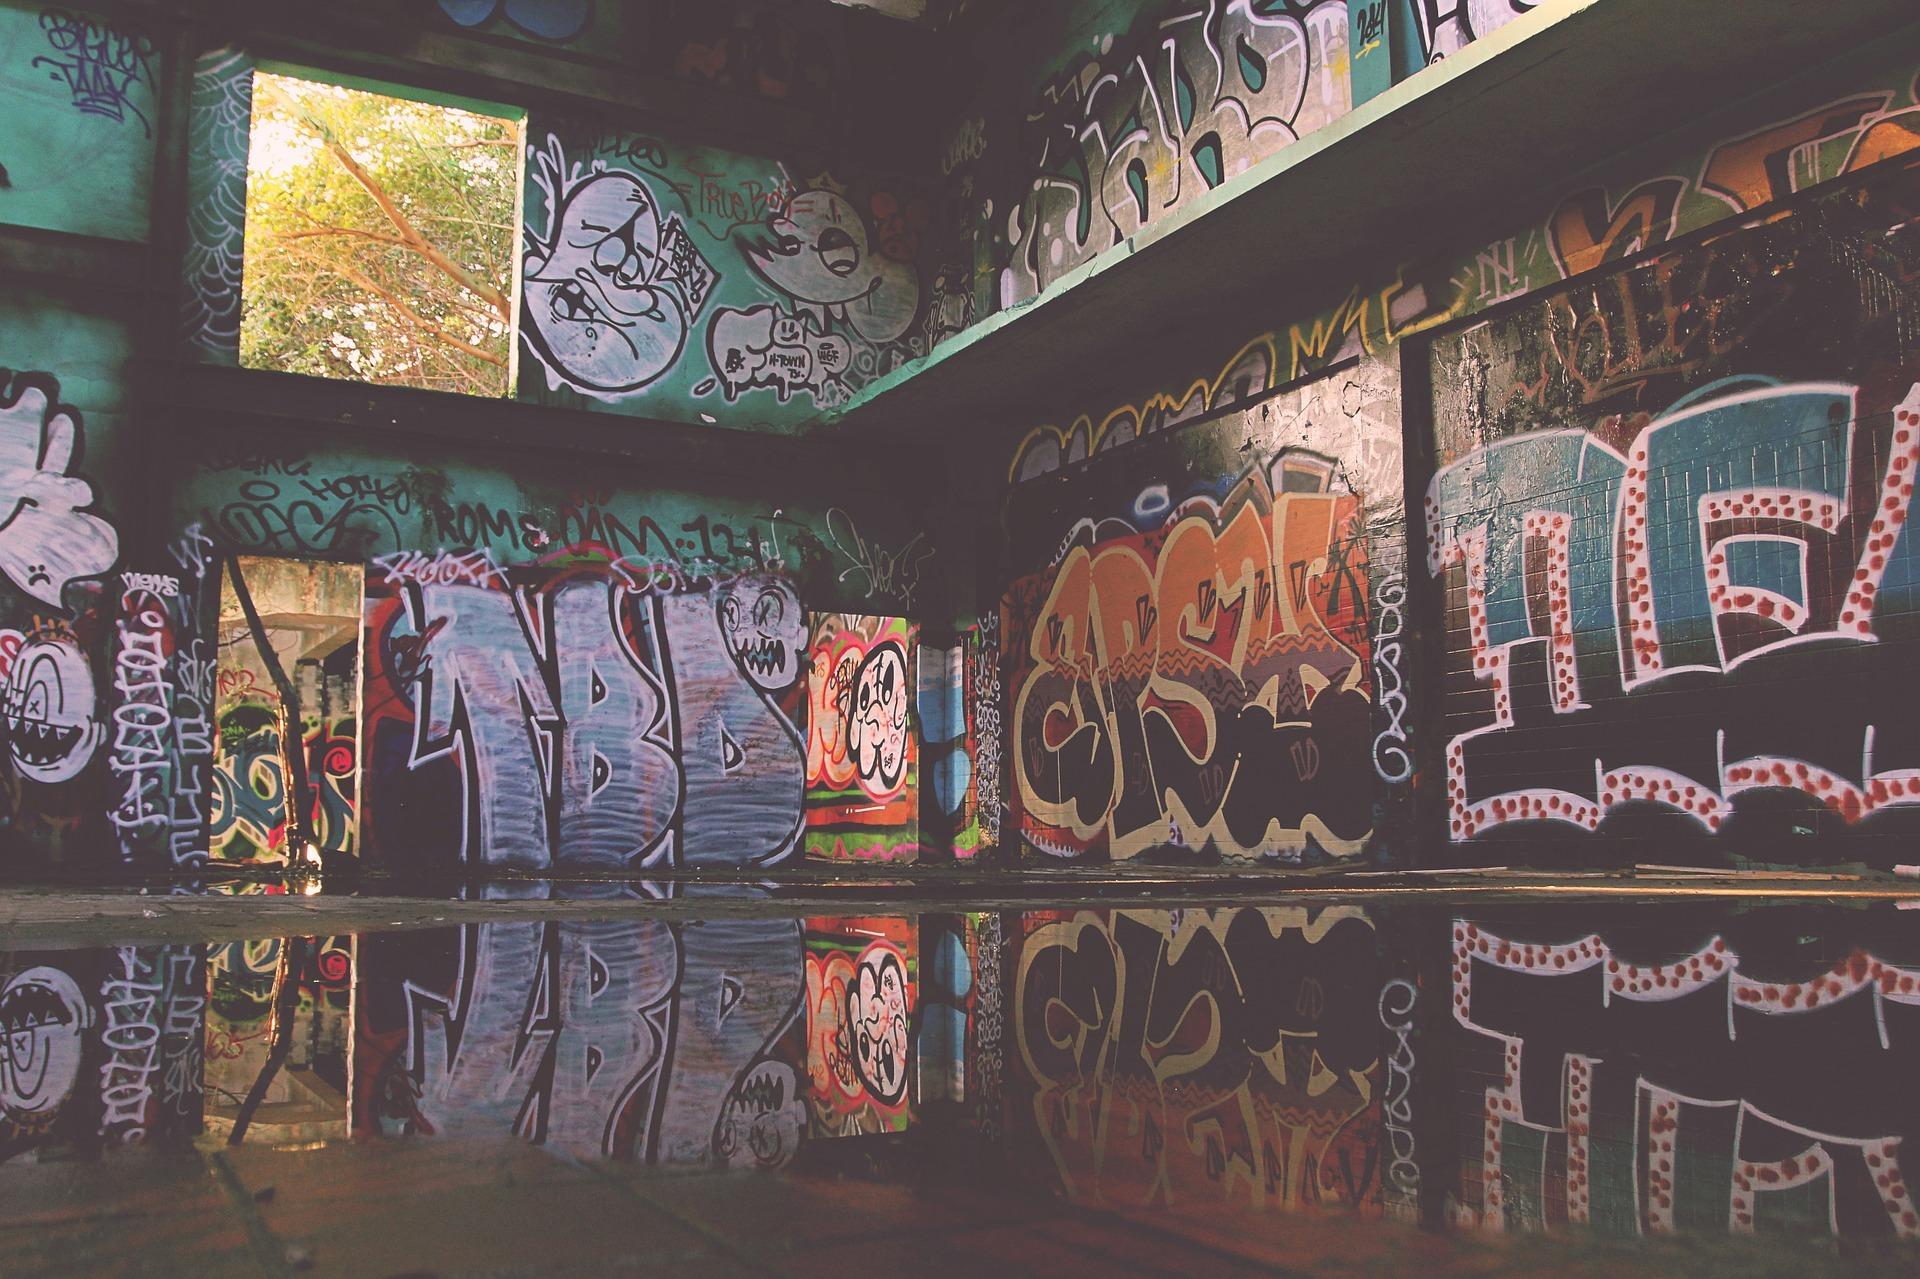 Corner with graffiti